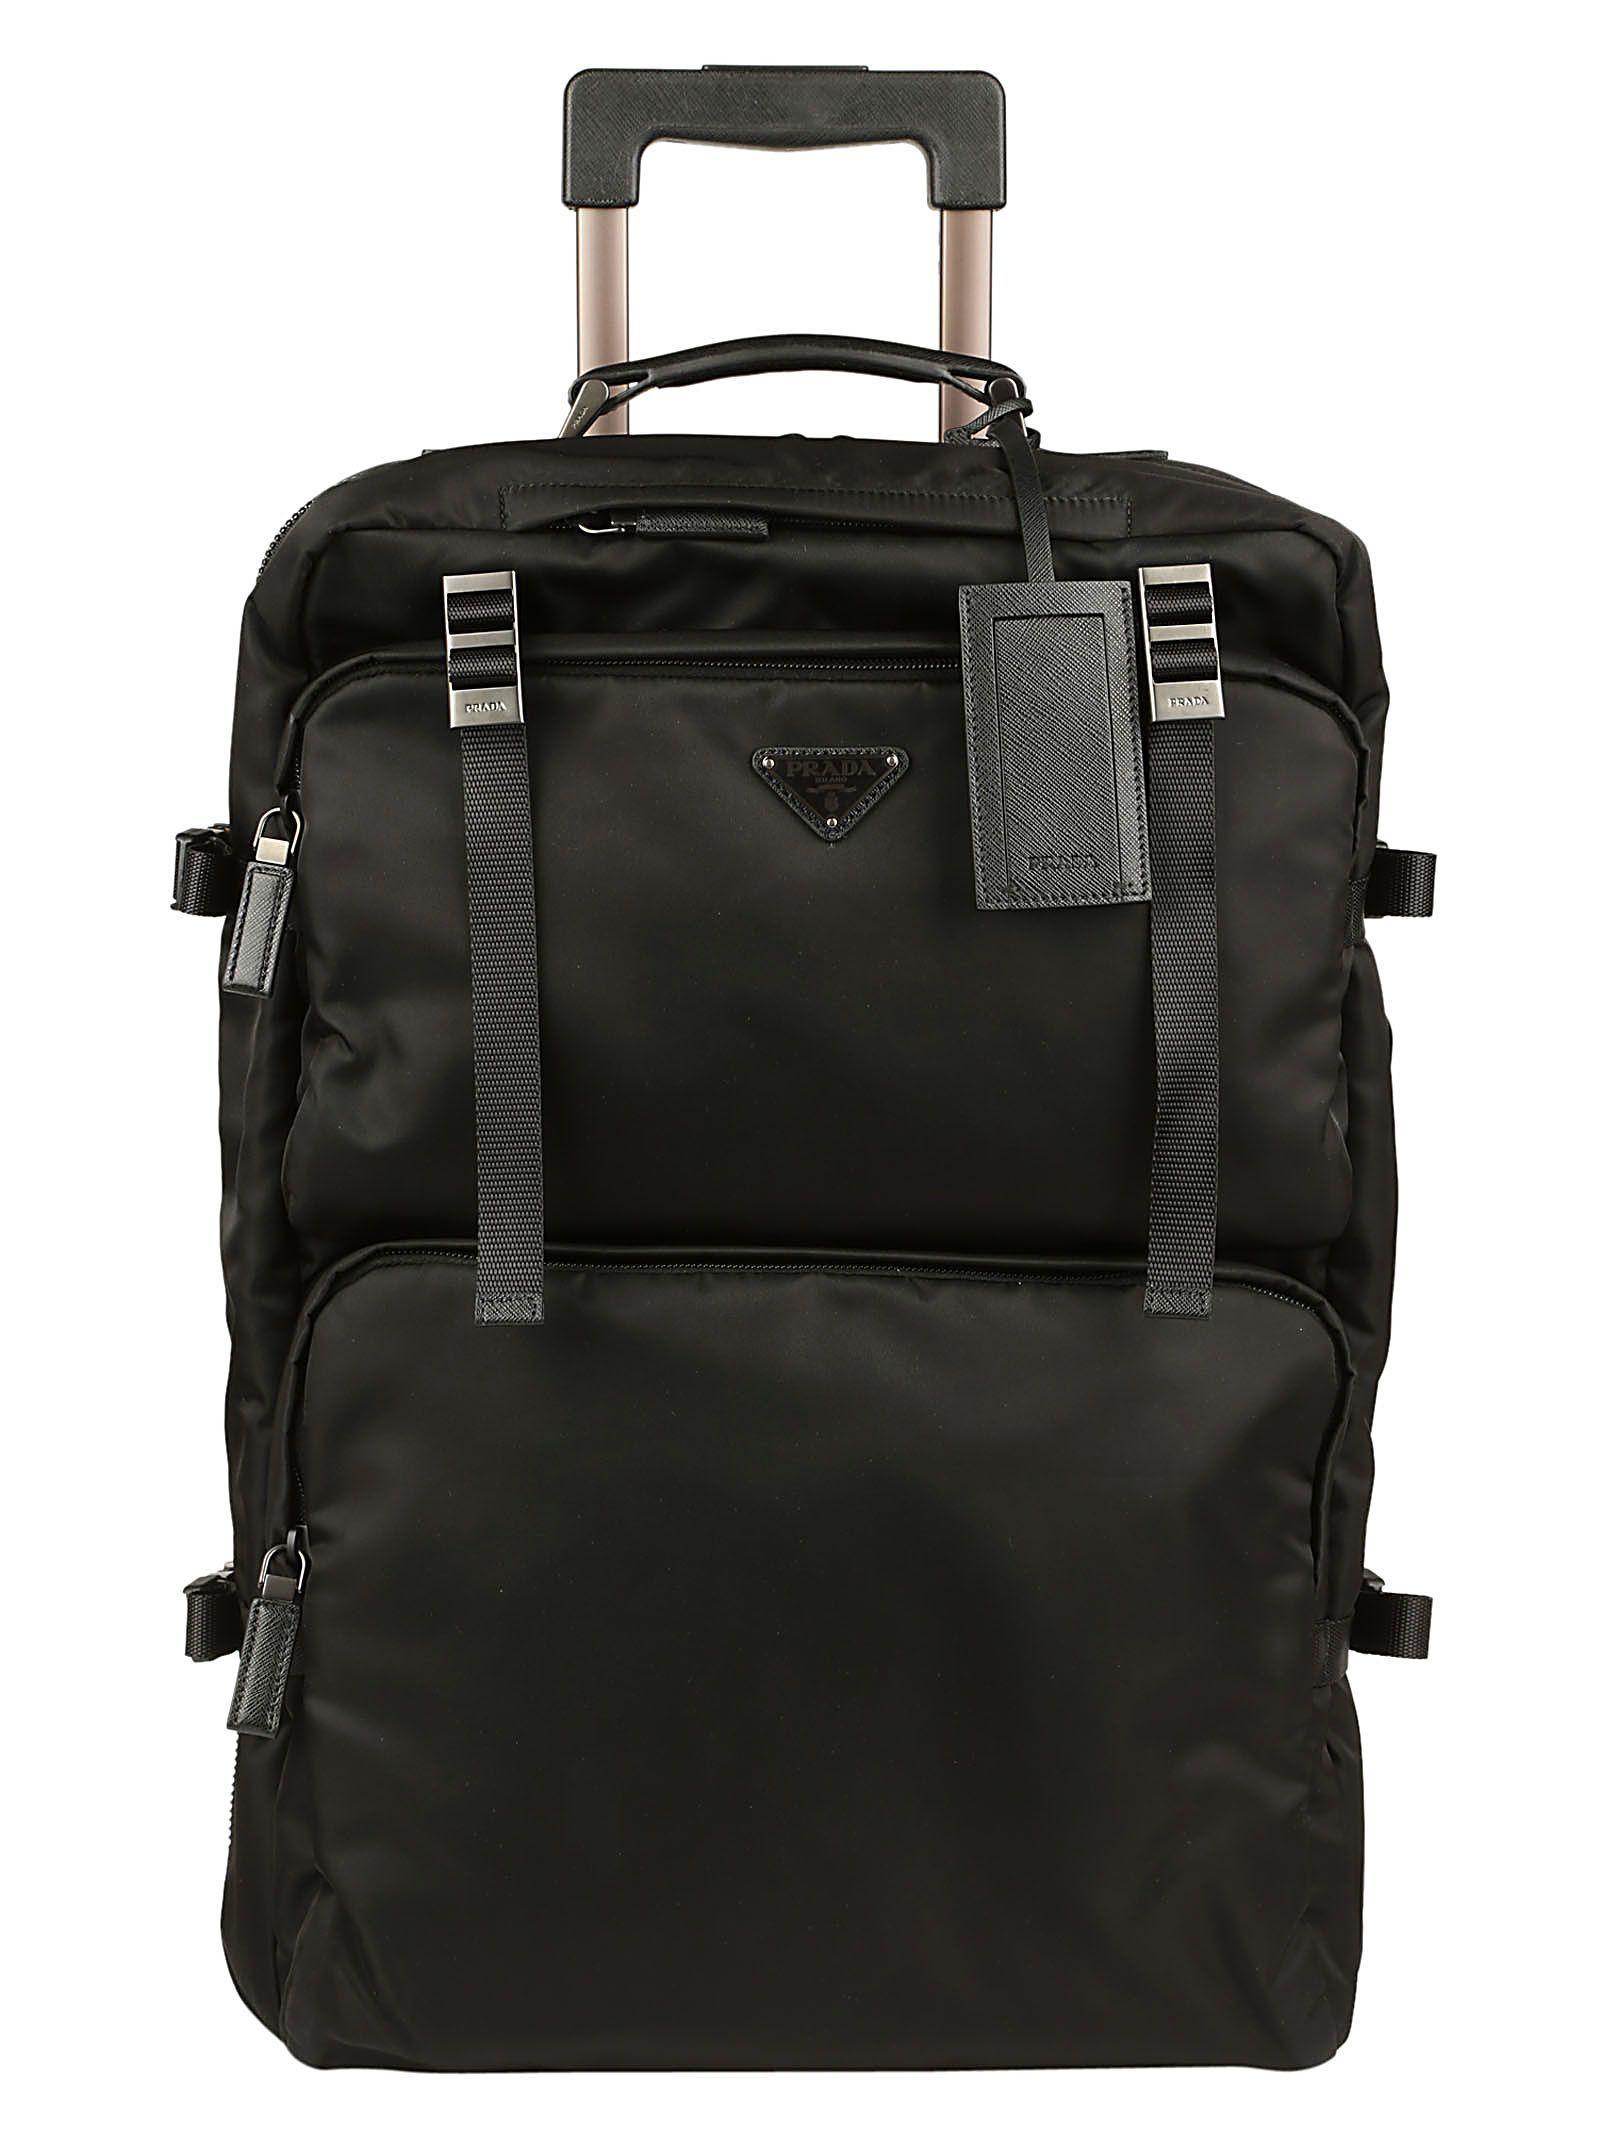 95be922fc7dc PRADA TRAVEL BAG. #prada #bags #trolley #leather #travel bags #nylon ...